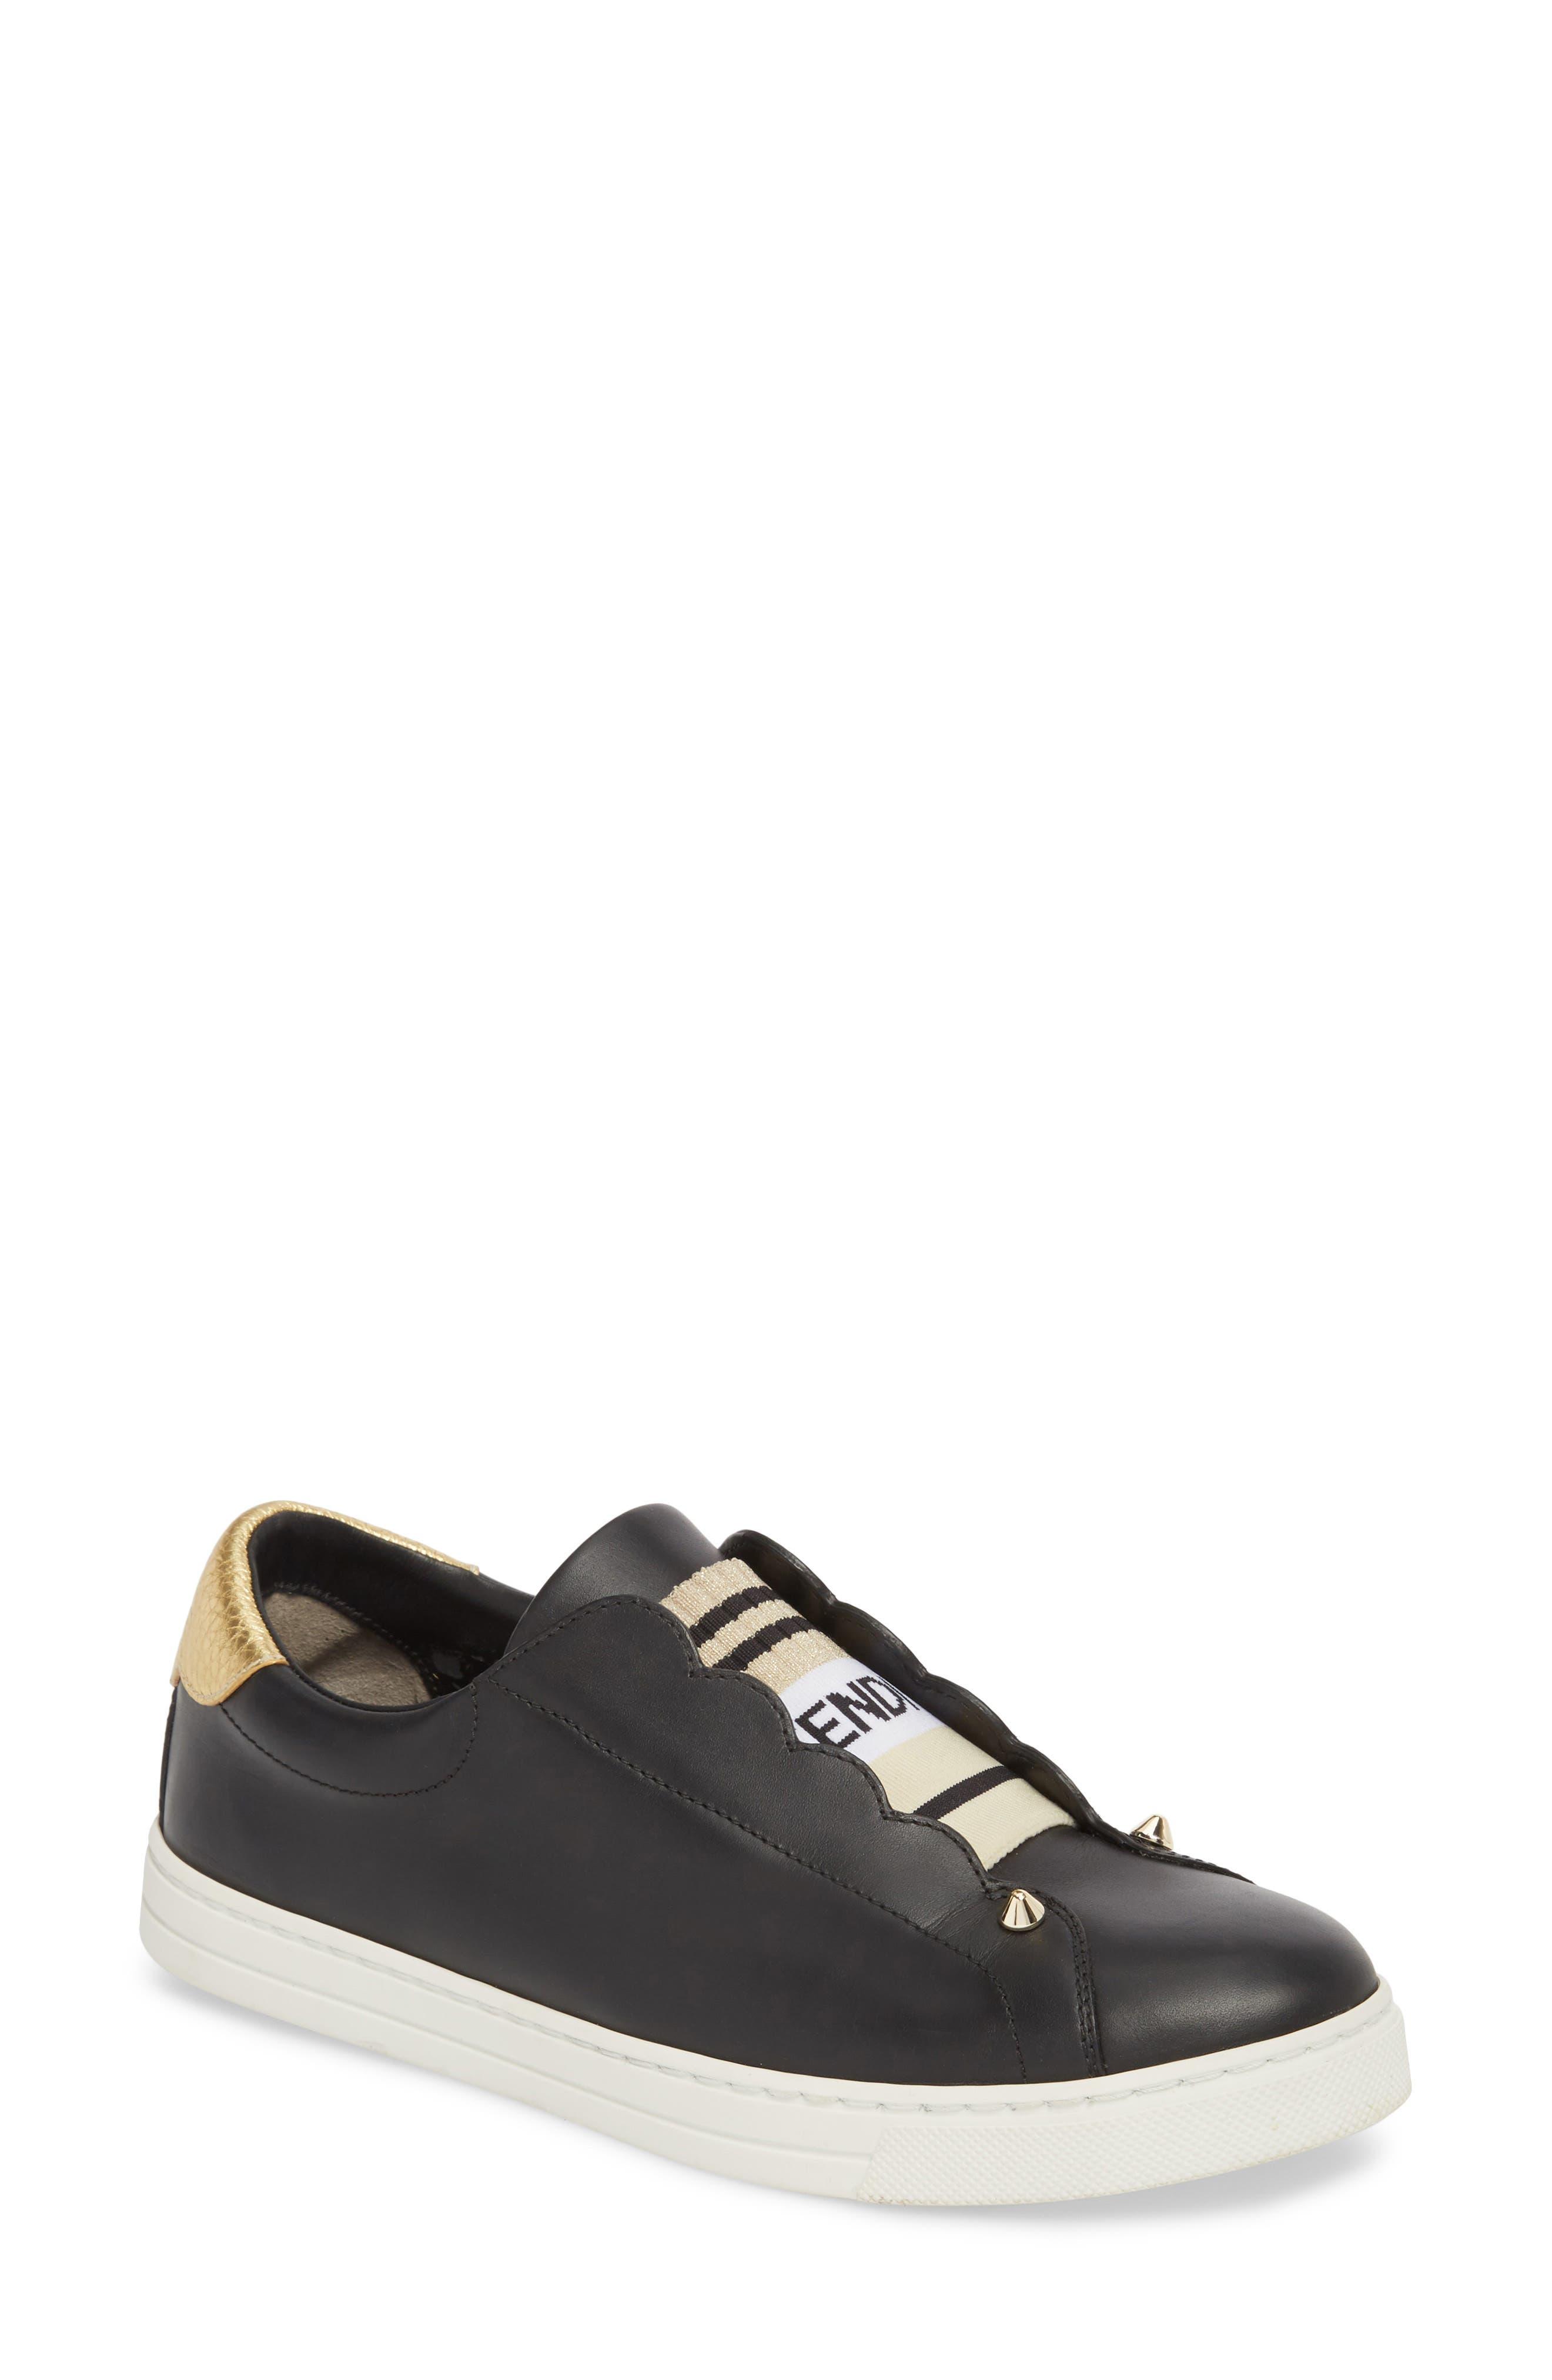 Rockoclick Slip-On Sneaker,                         Main,                         color, BLACK